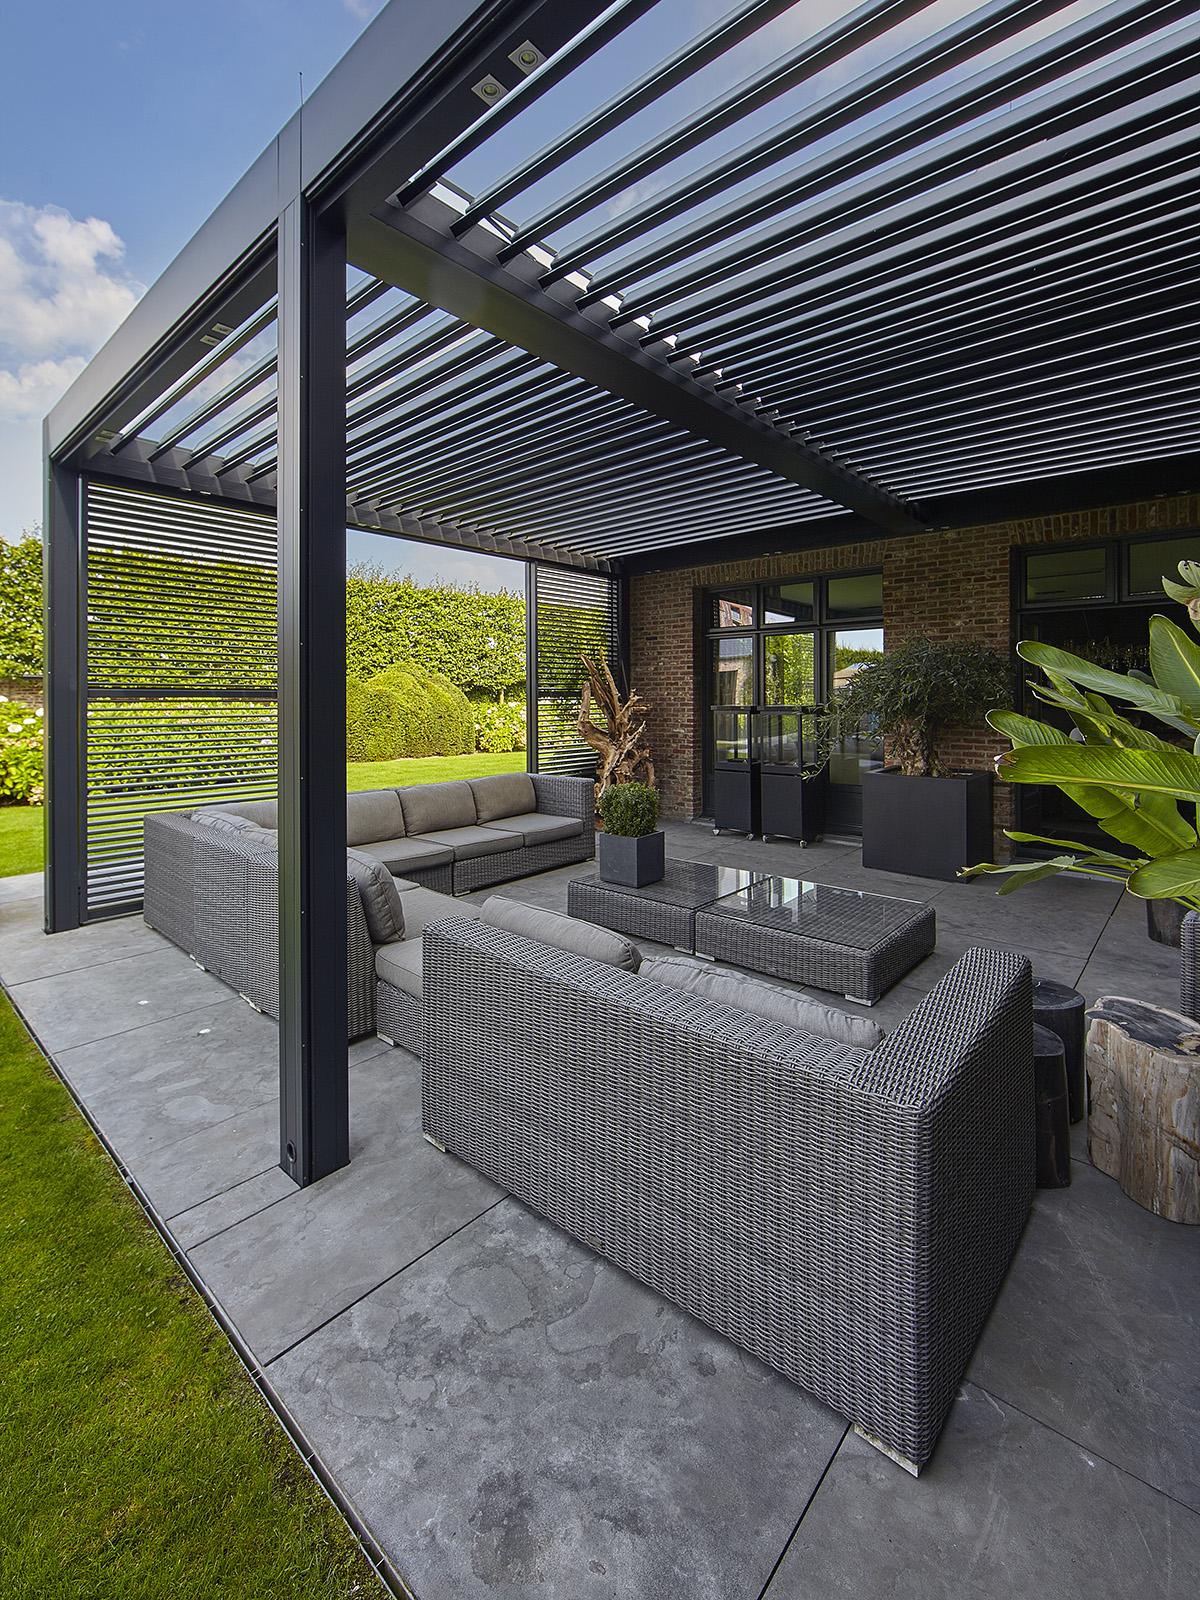 Romantische tuin, Ludo Dierckx, Zwembad, Poolhouse, Openheid, Terras, Overkapping, Lounge